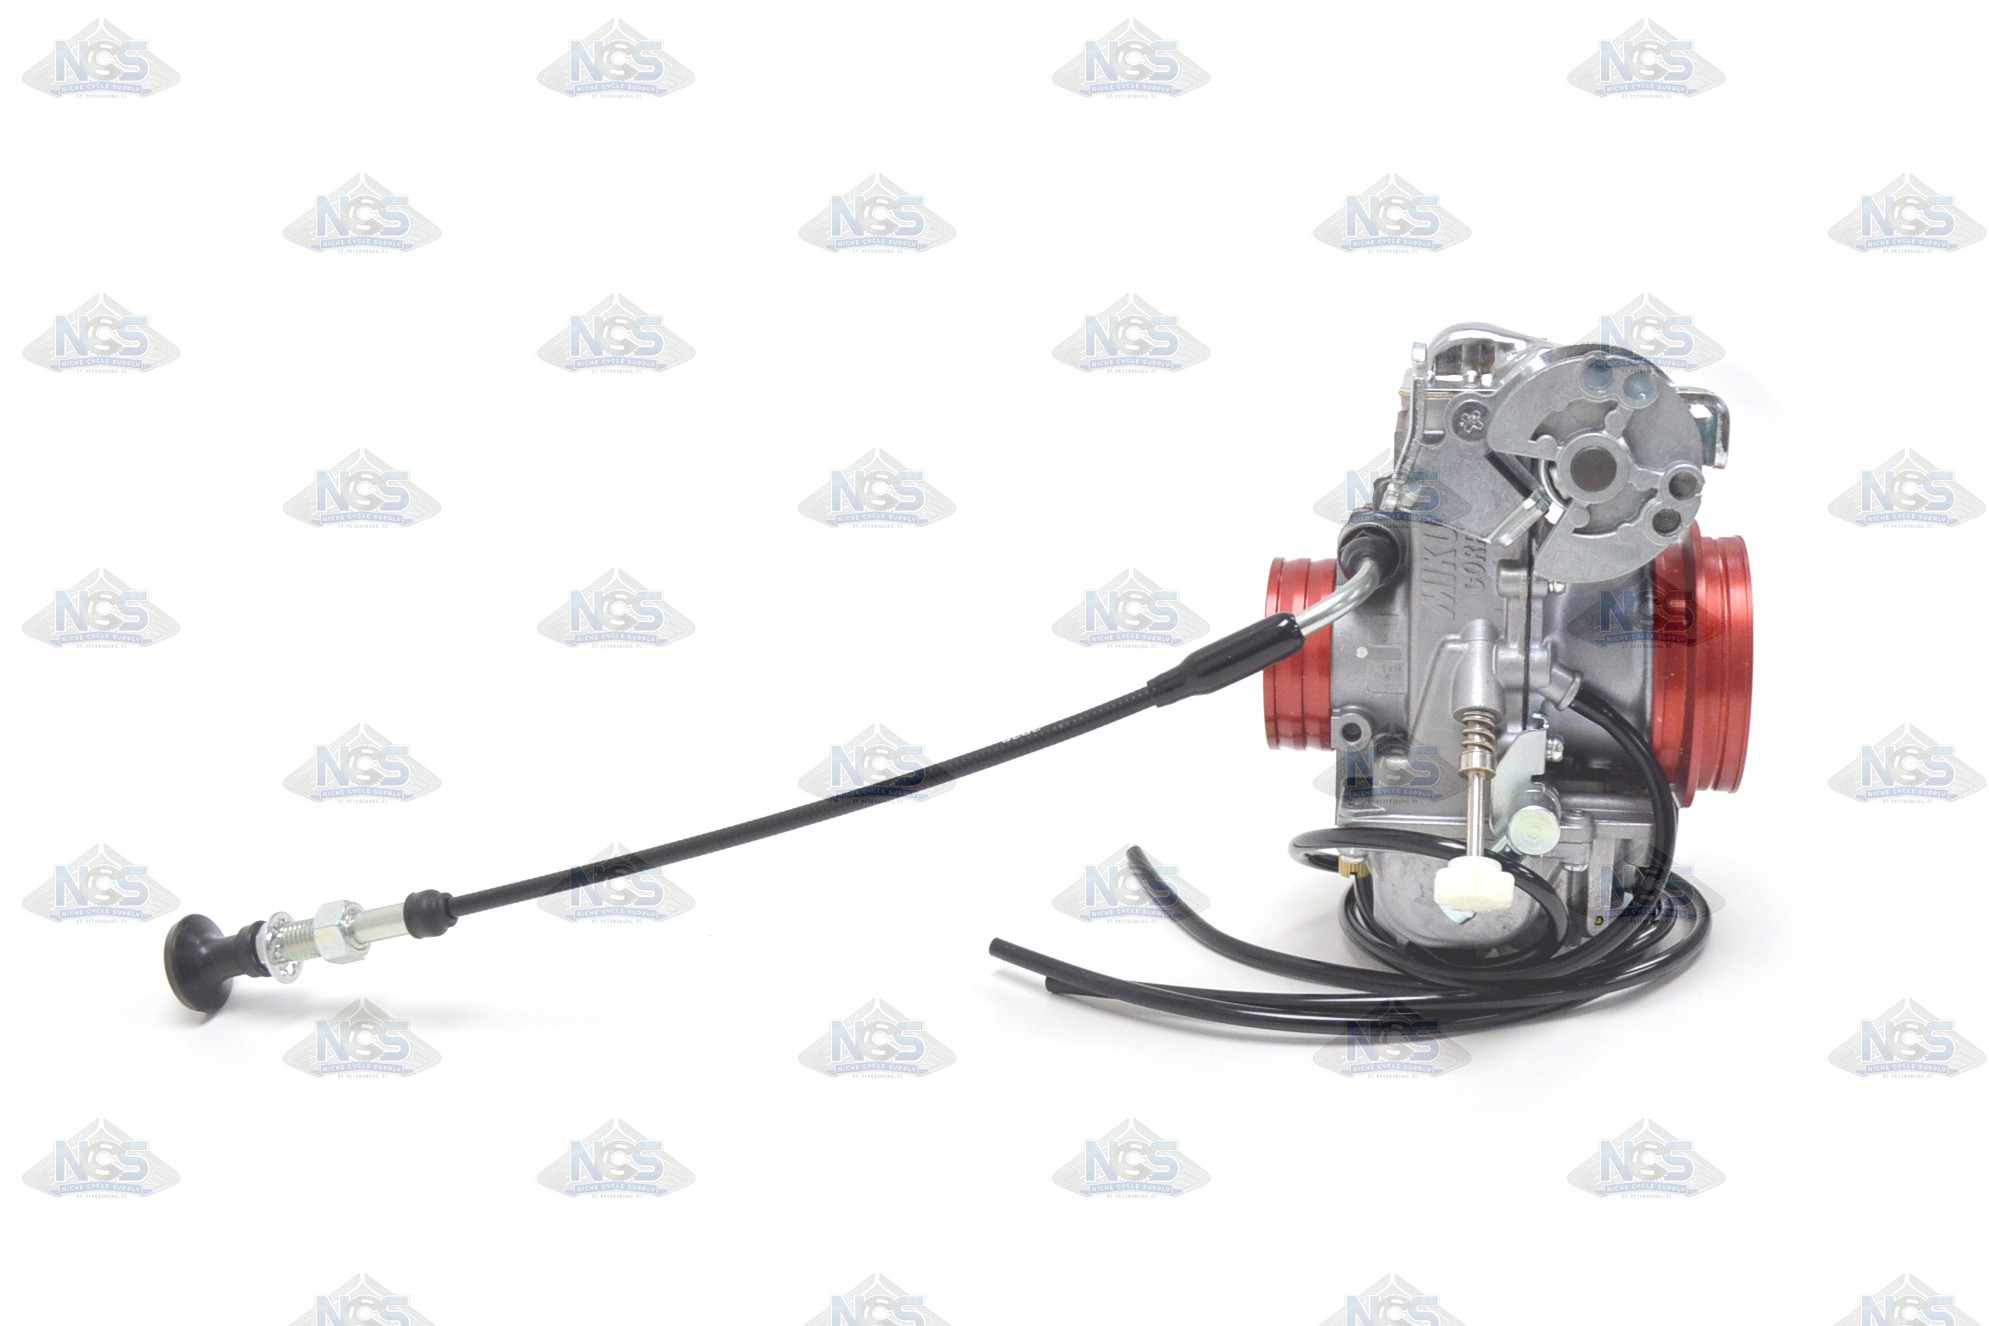 Honda Xr650r Mikuni Tm40 Carburetor Conversion Kit With Remote Choke